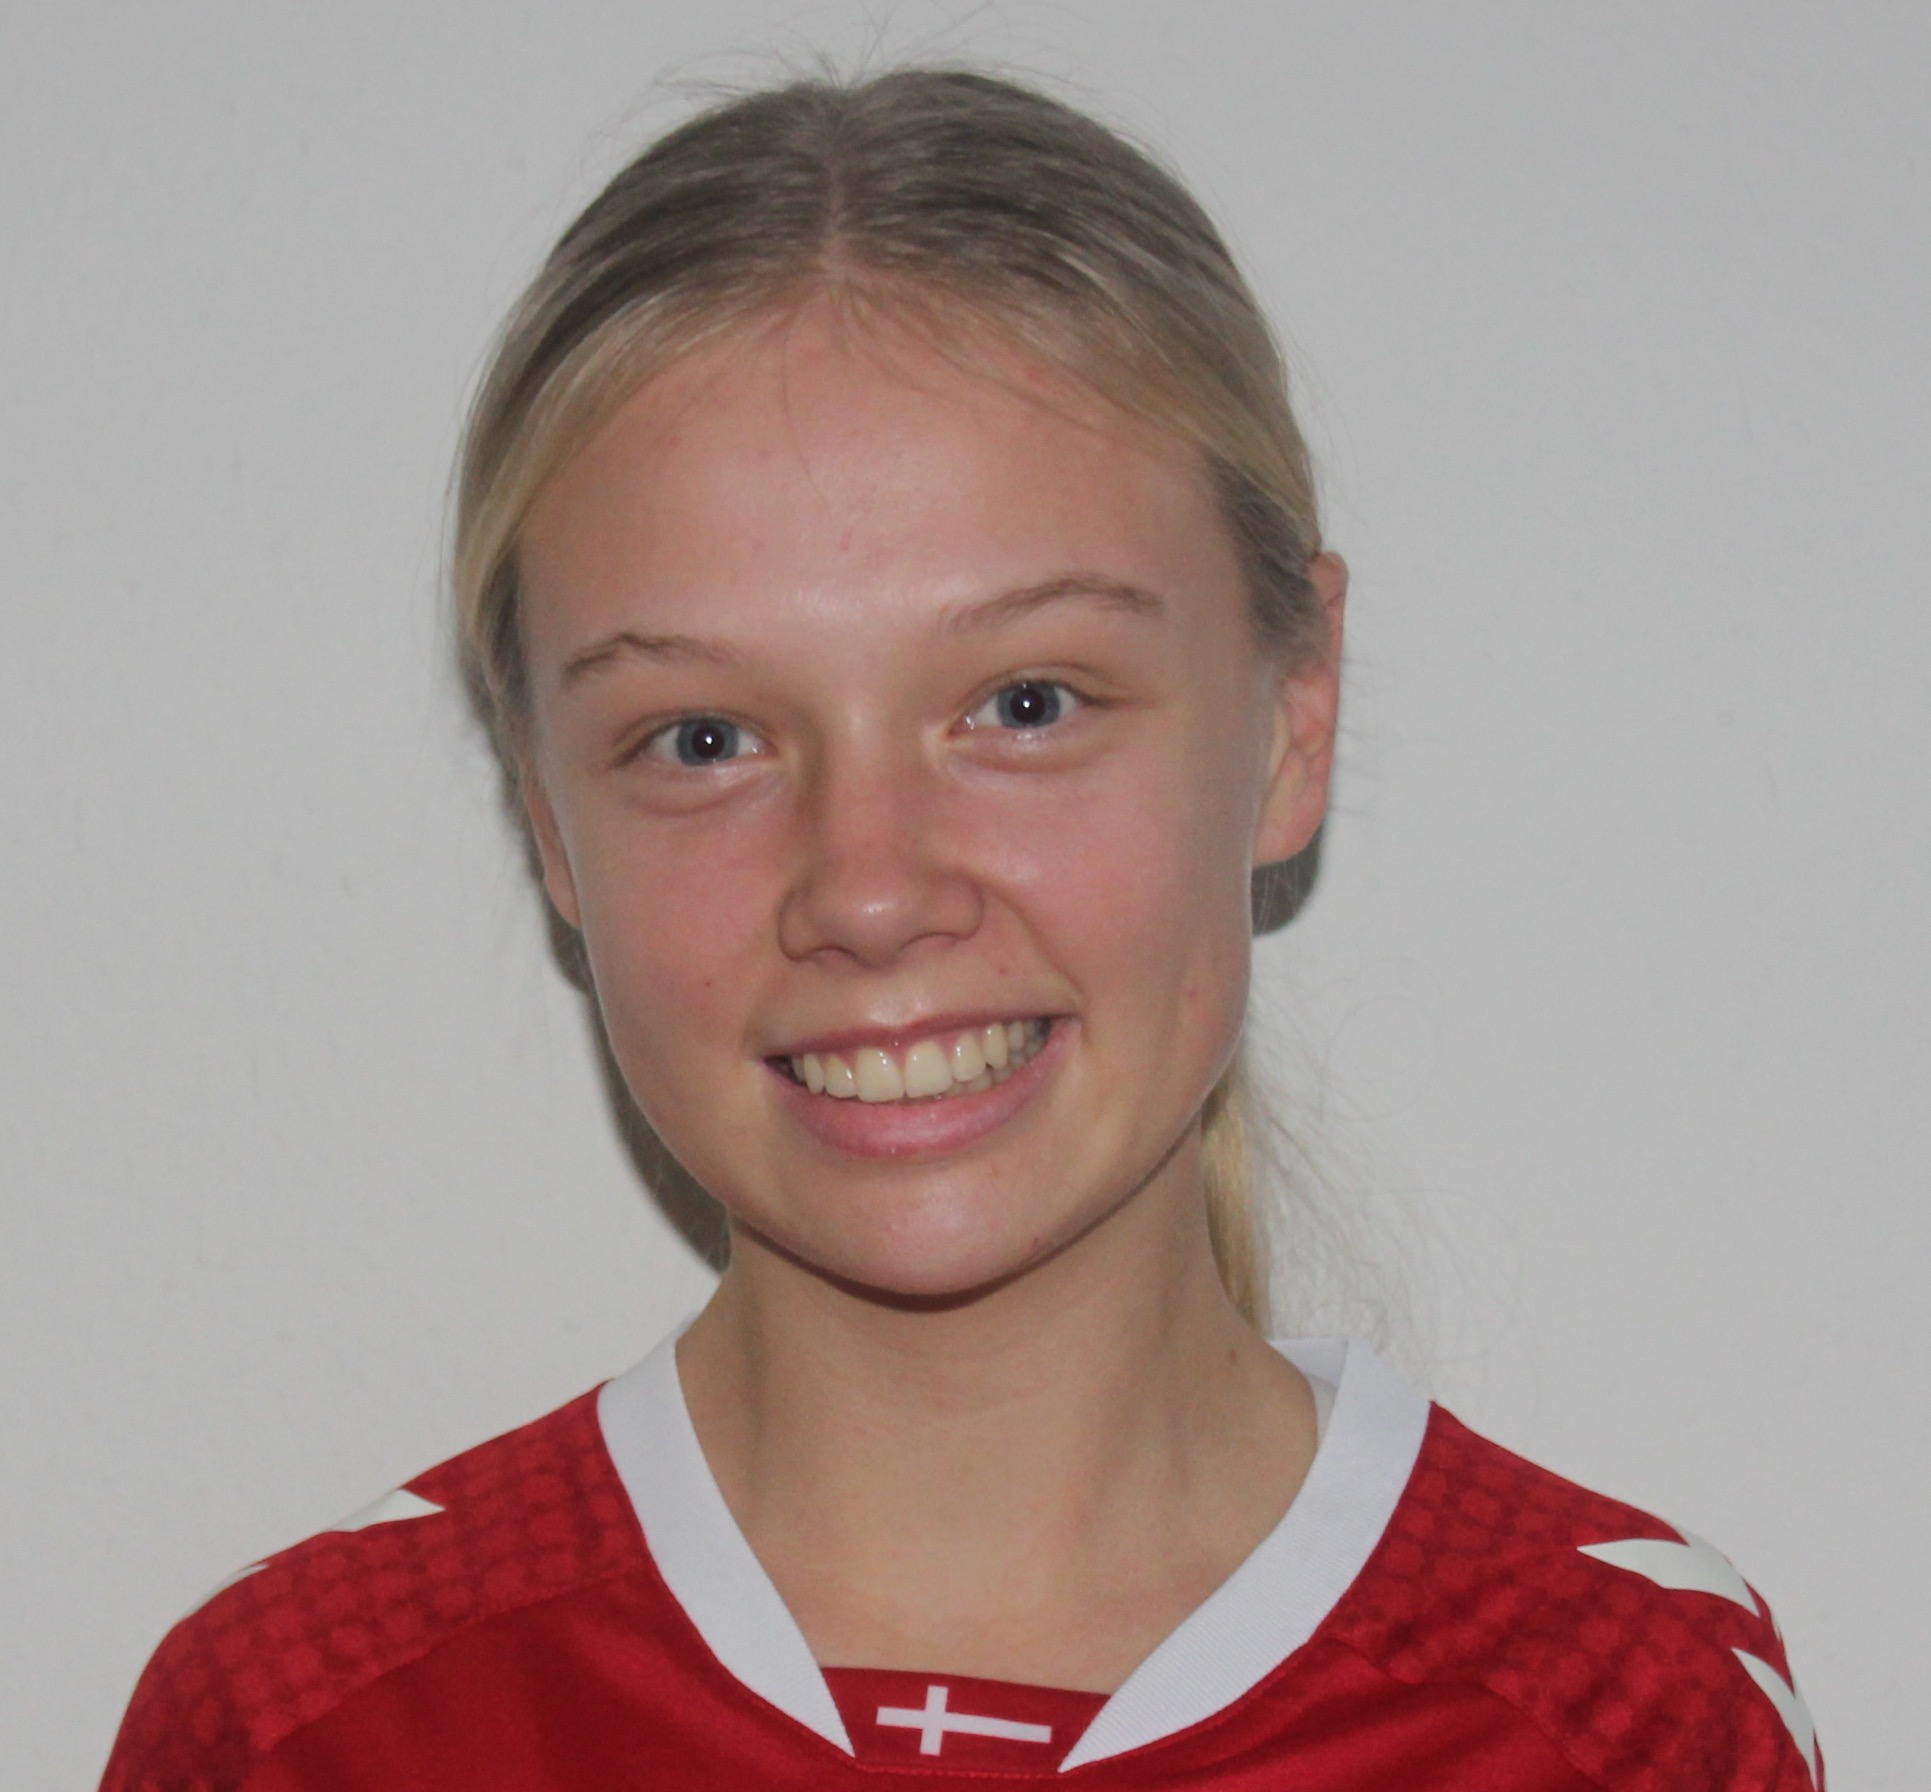 Sofie Kamp